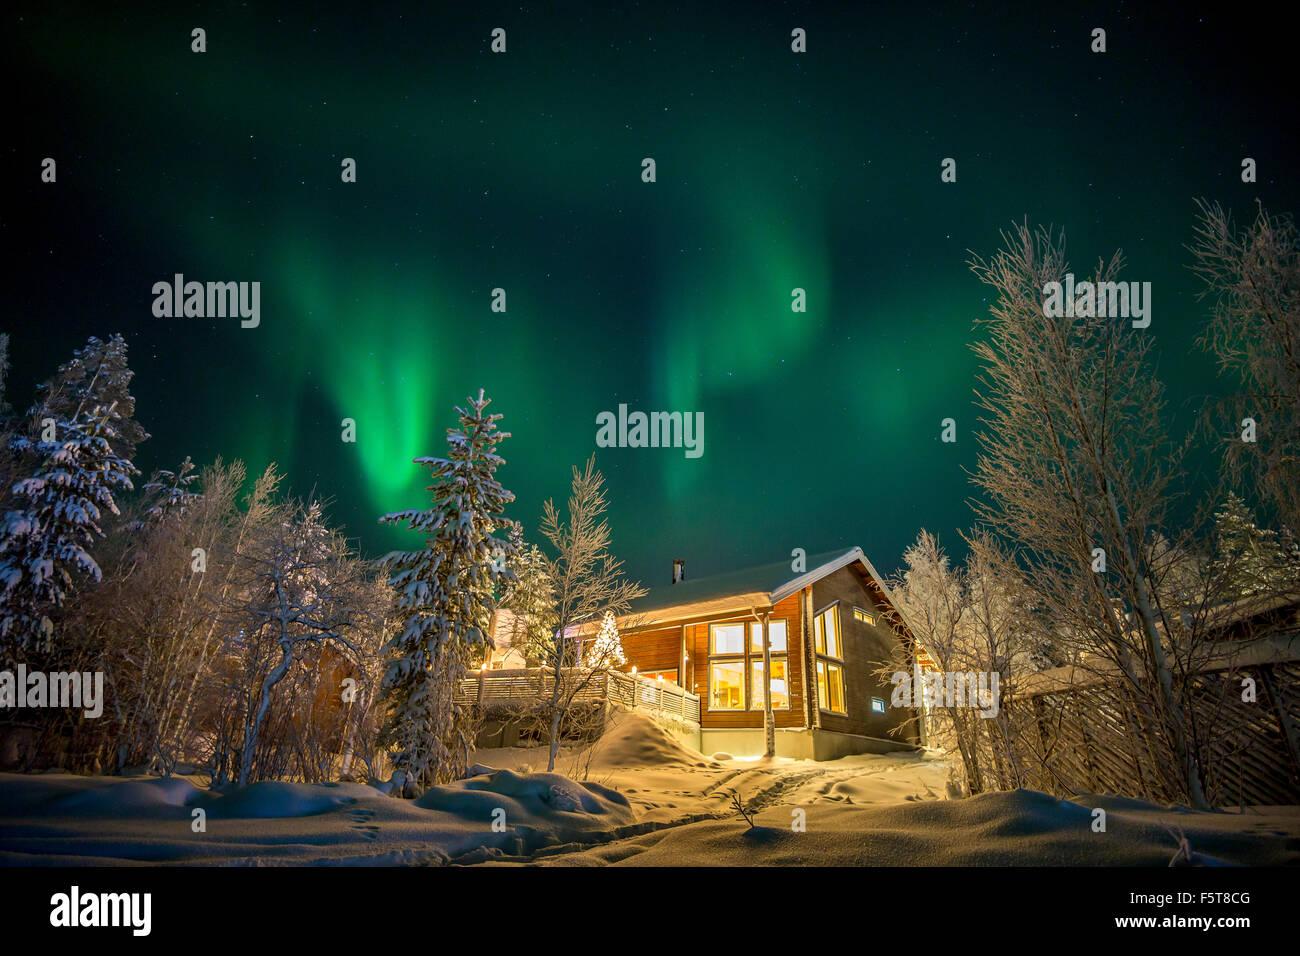 Finland, Lapland, Kittila, Levi, Aurora borealis over cottage - Stock Image